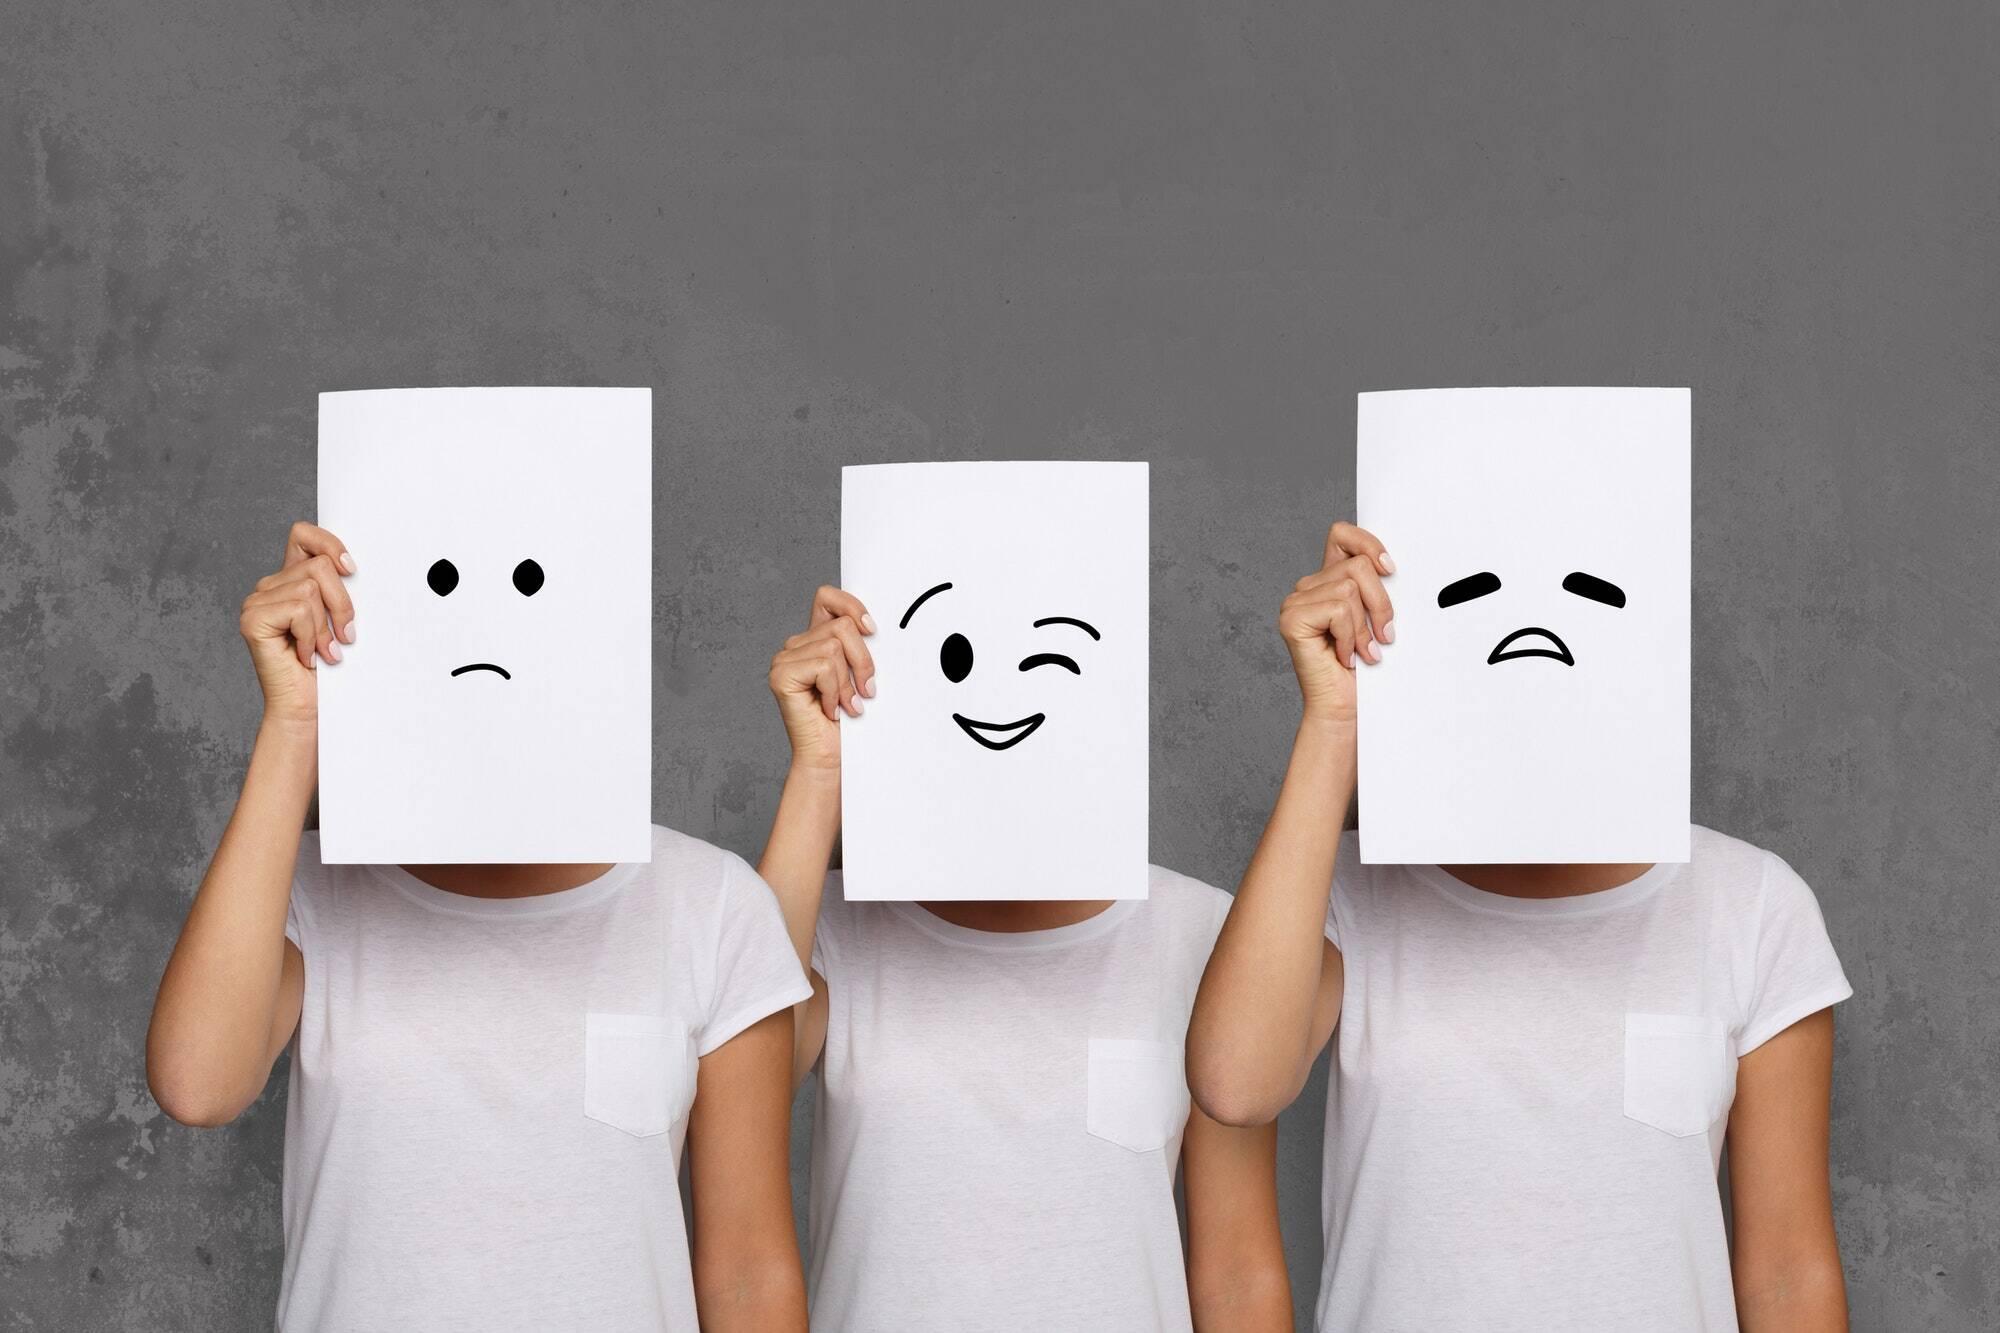 harmonylife.gr - Επικοινωνω τα συναισθηματα μου;